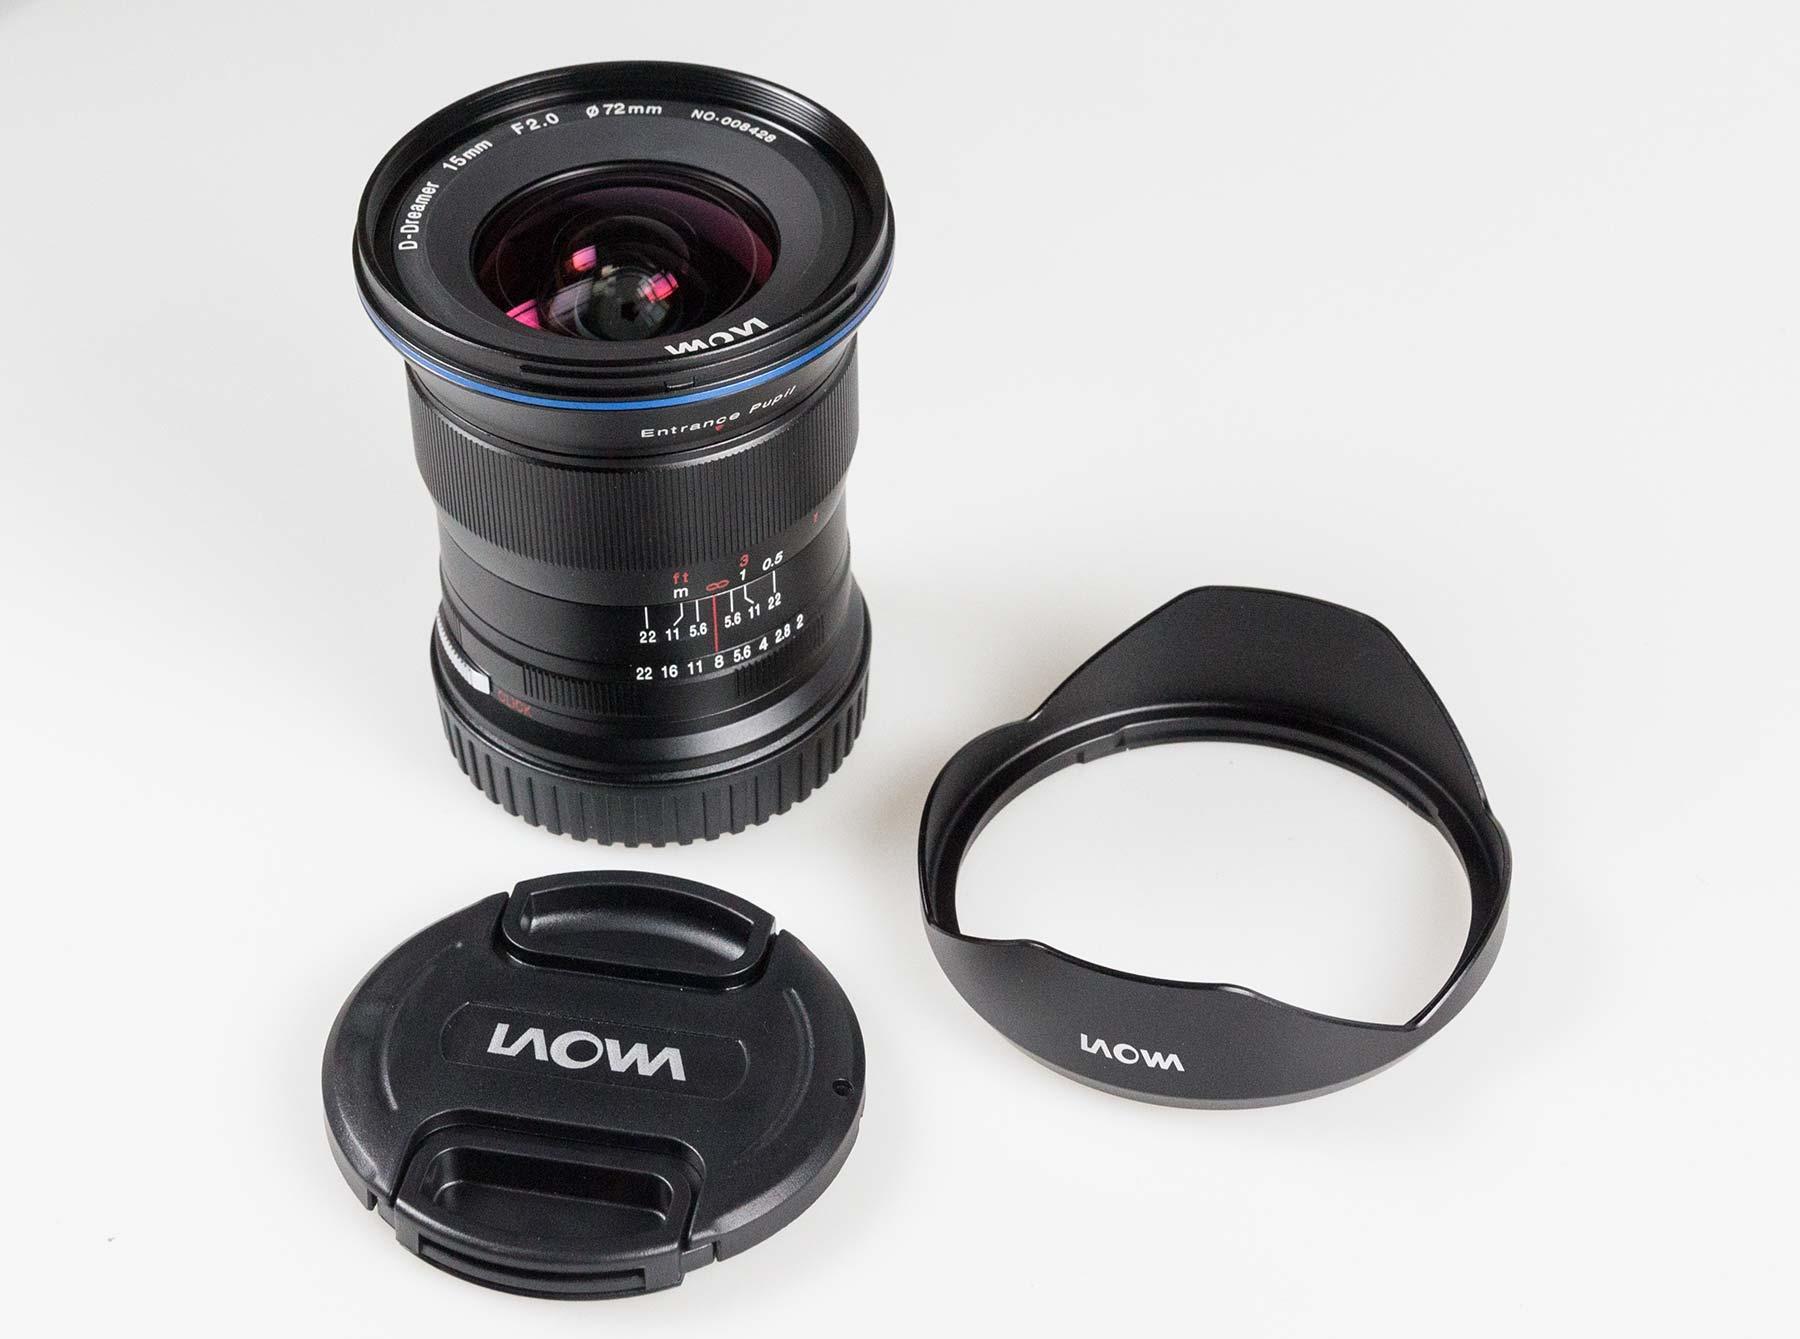 lens-cap-and-hood